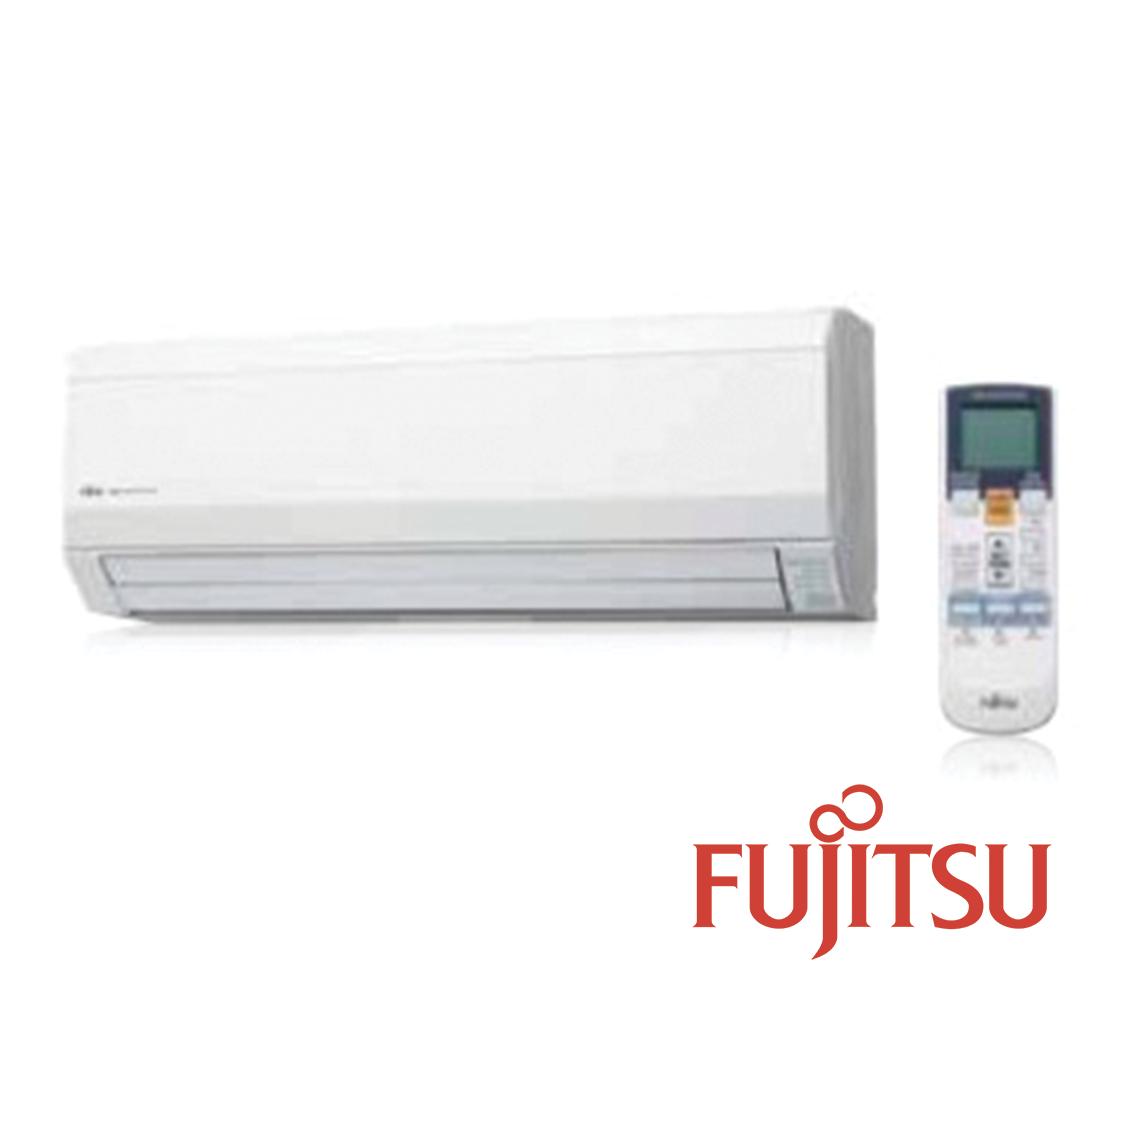 Fujitsu 6.0kw Inverter Split Set Air Conditioner